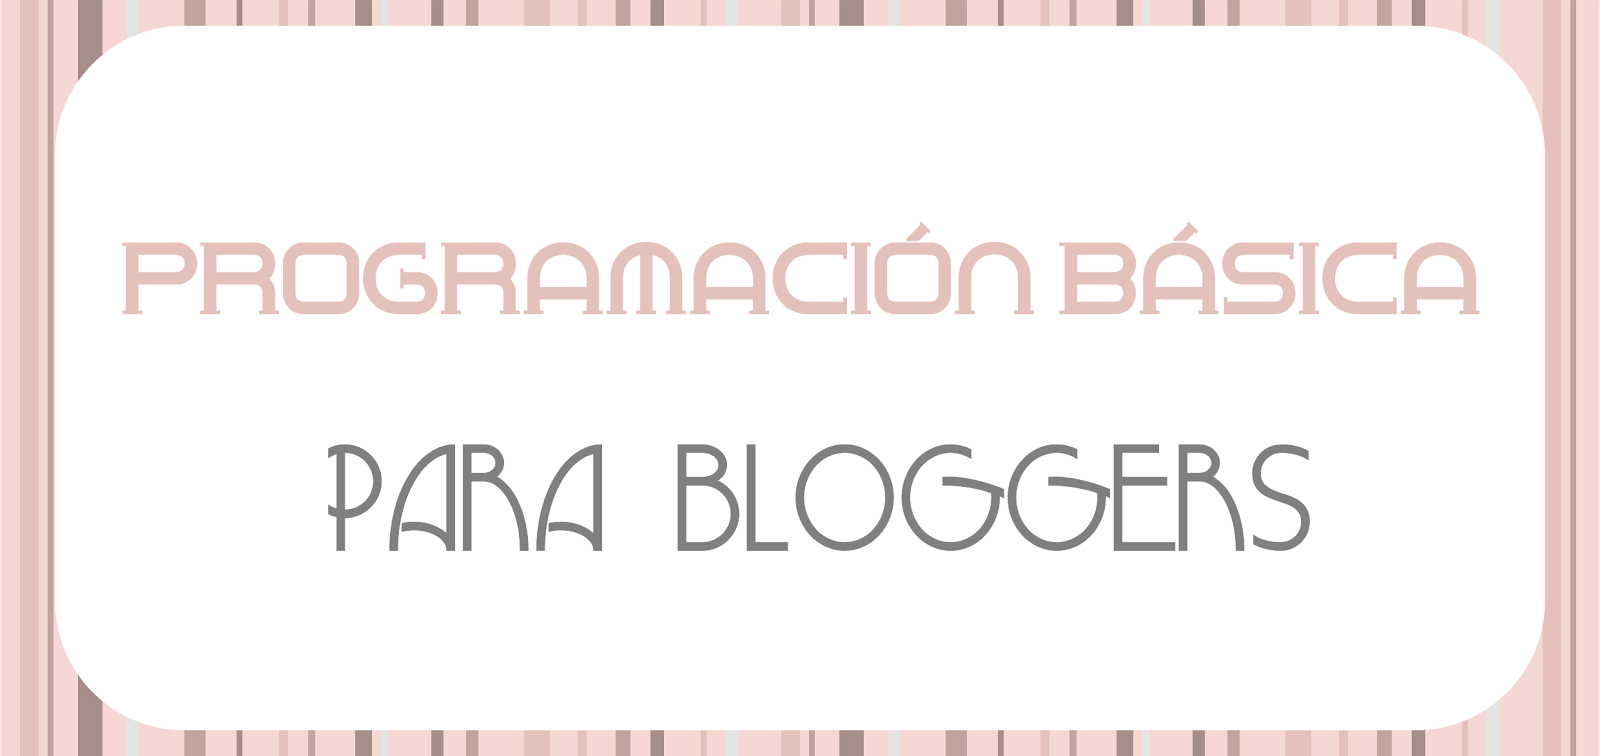 Instalar Menú Horizontal con pestañas en Blogger   BLOG   Pinterest ...